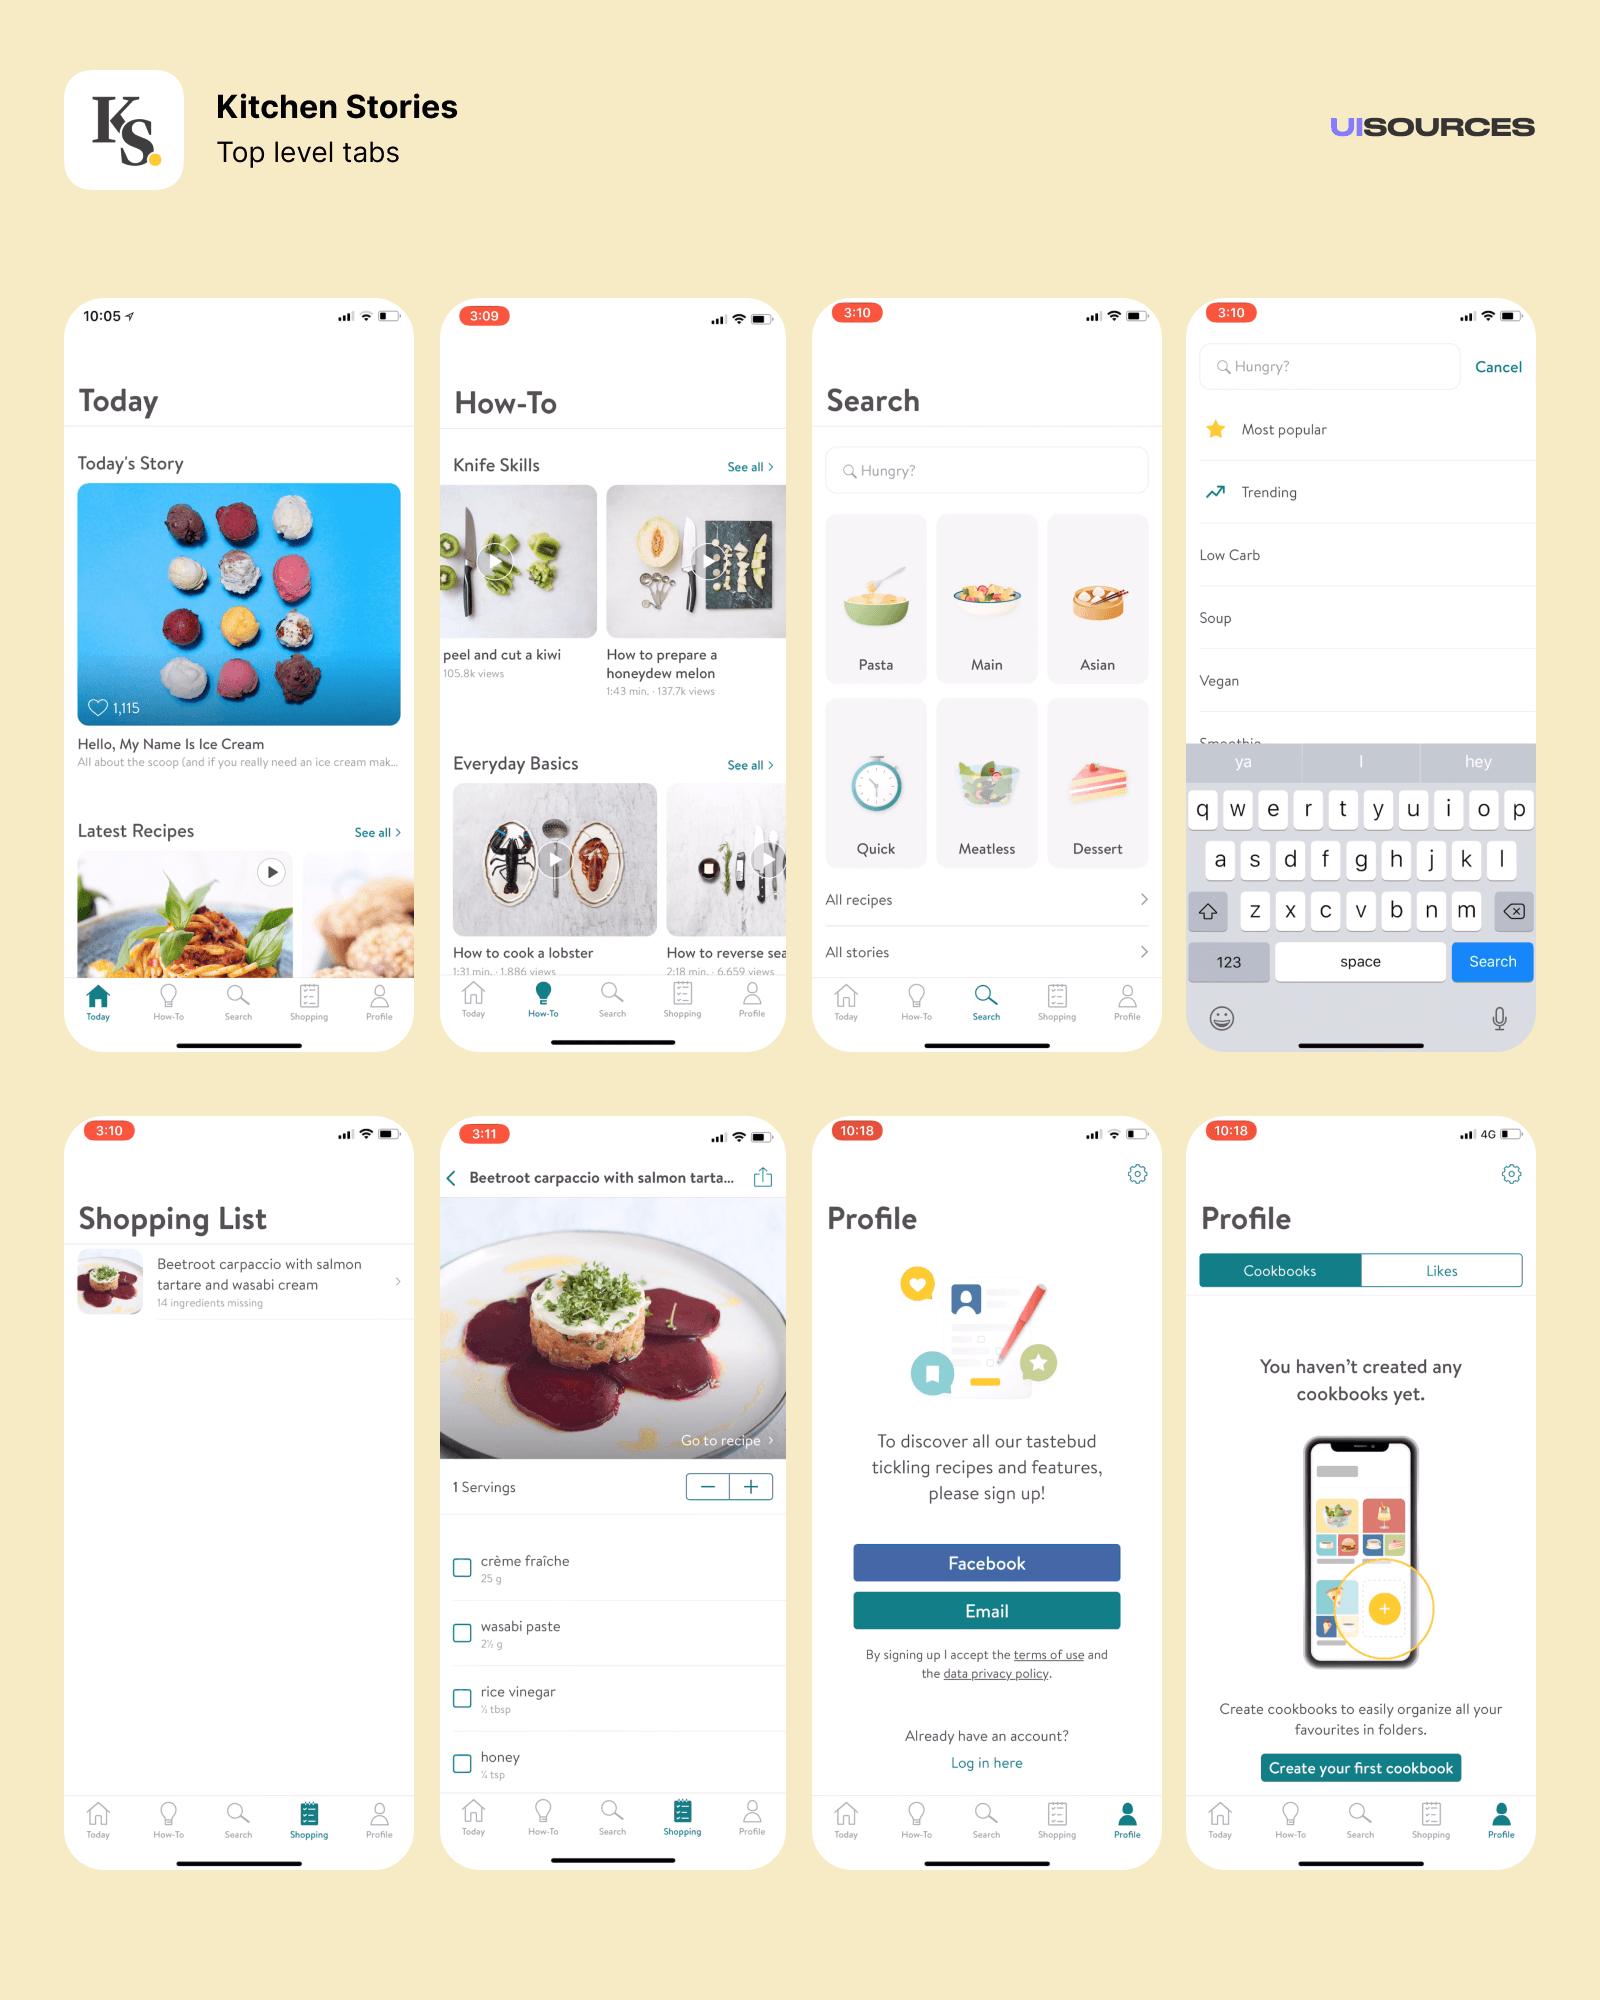 03 kitchen stories top level tabs